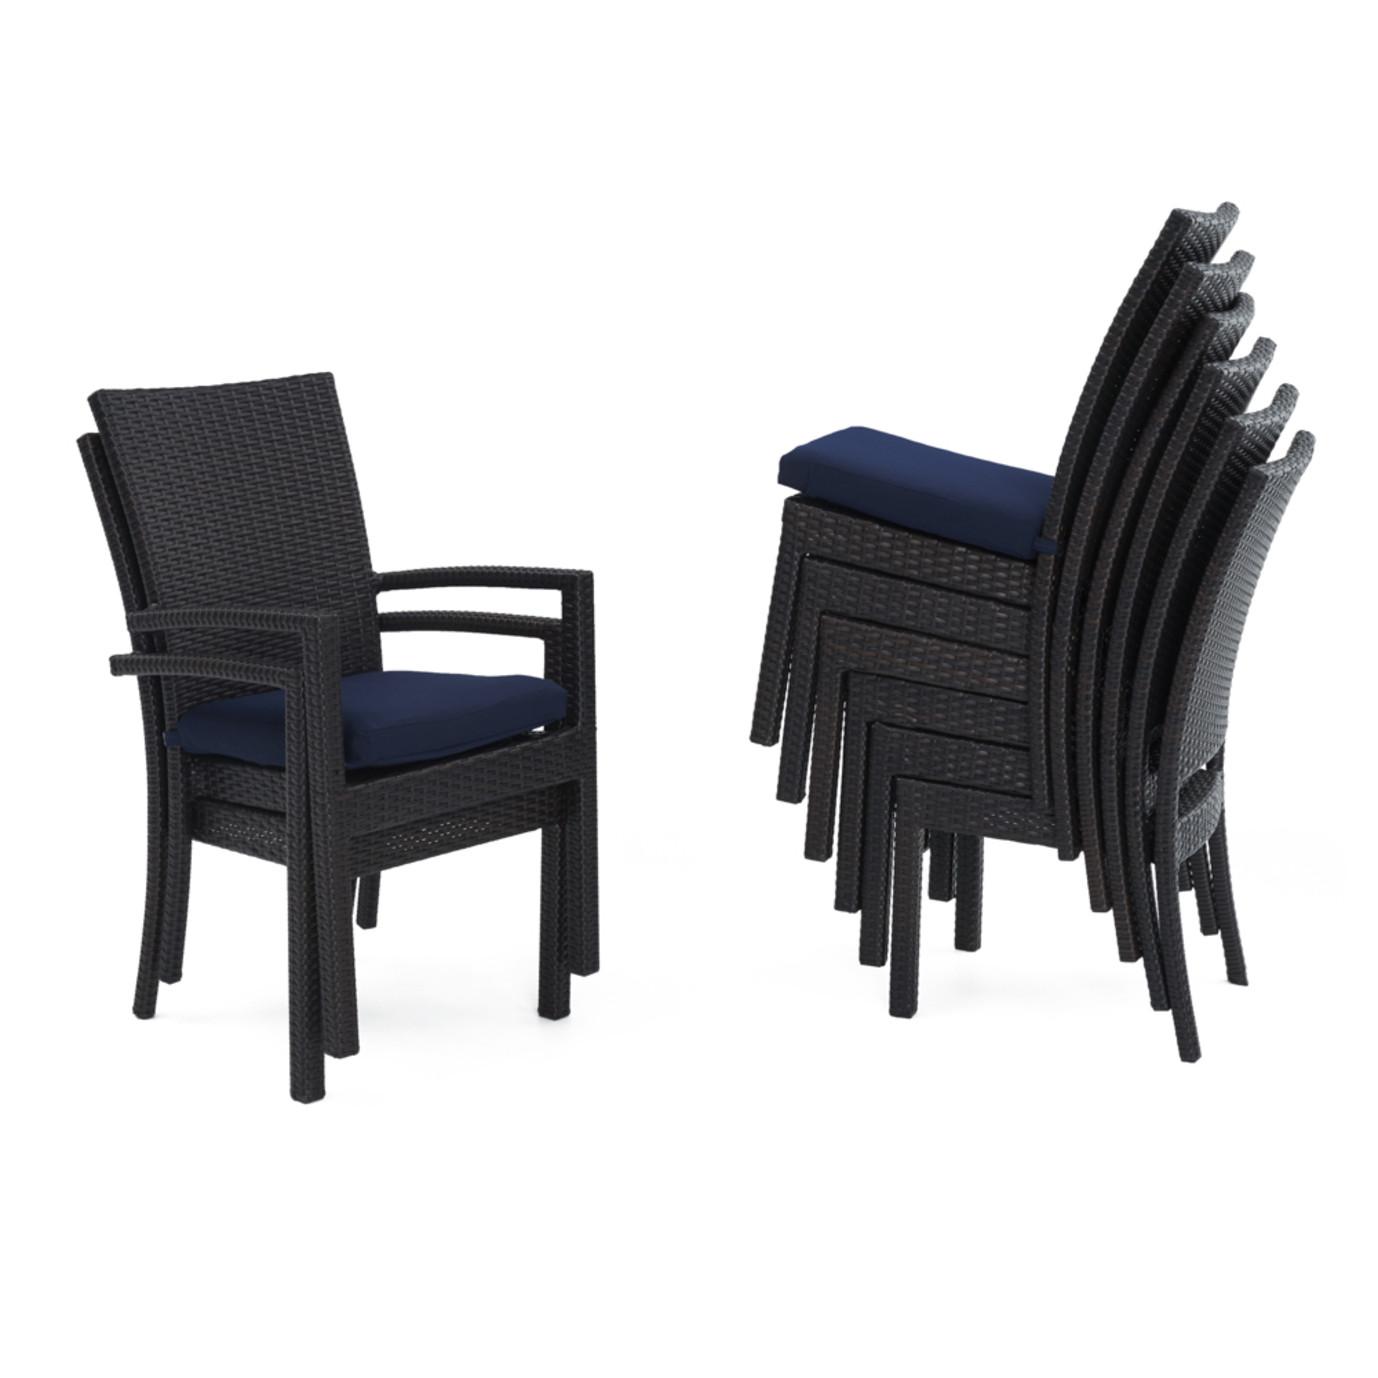 Deco™ 9pc Dining Set - Navy Blue